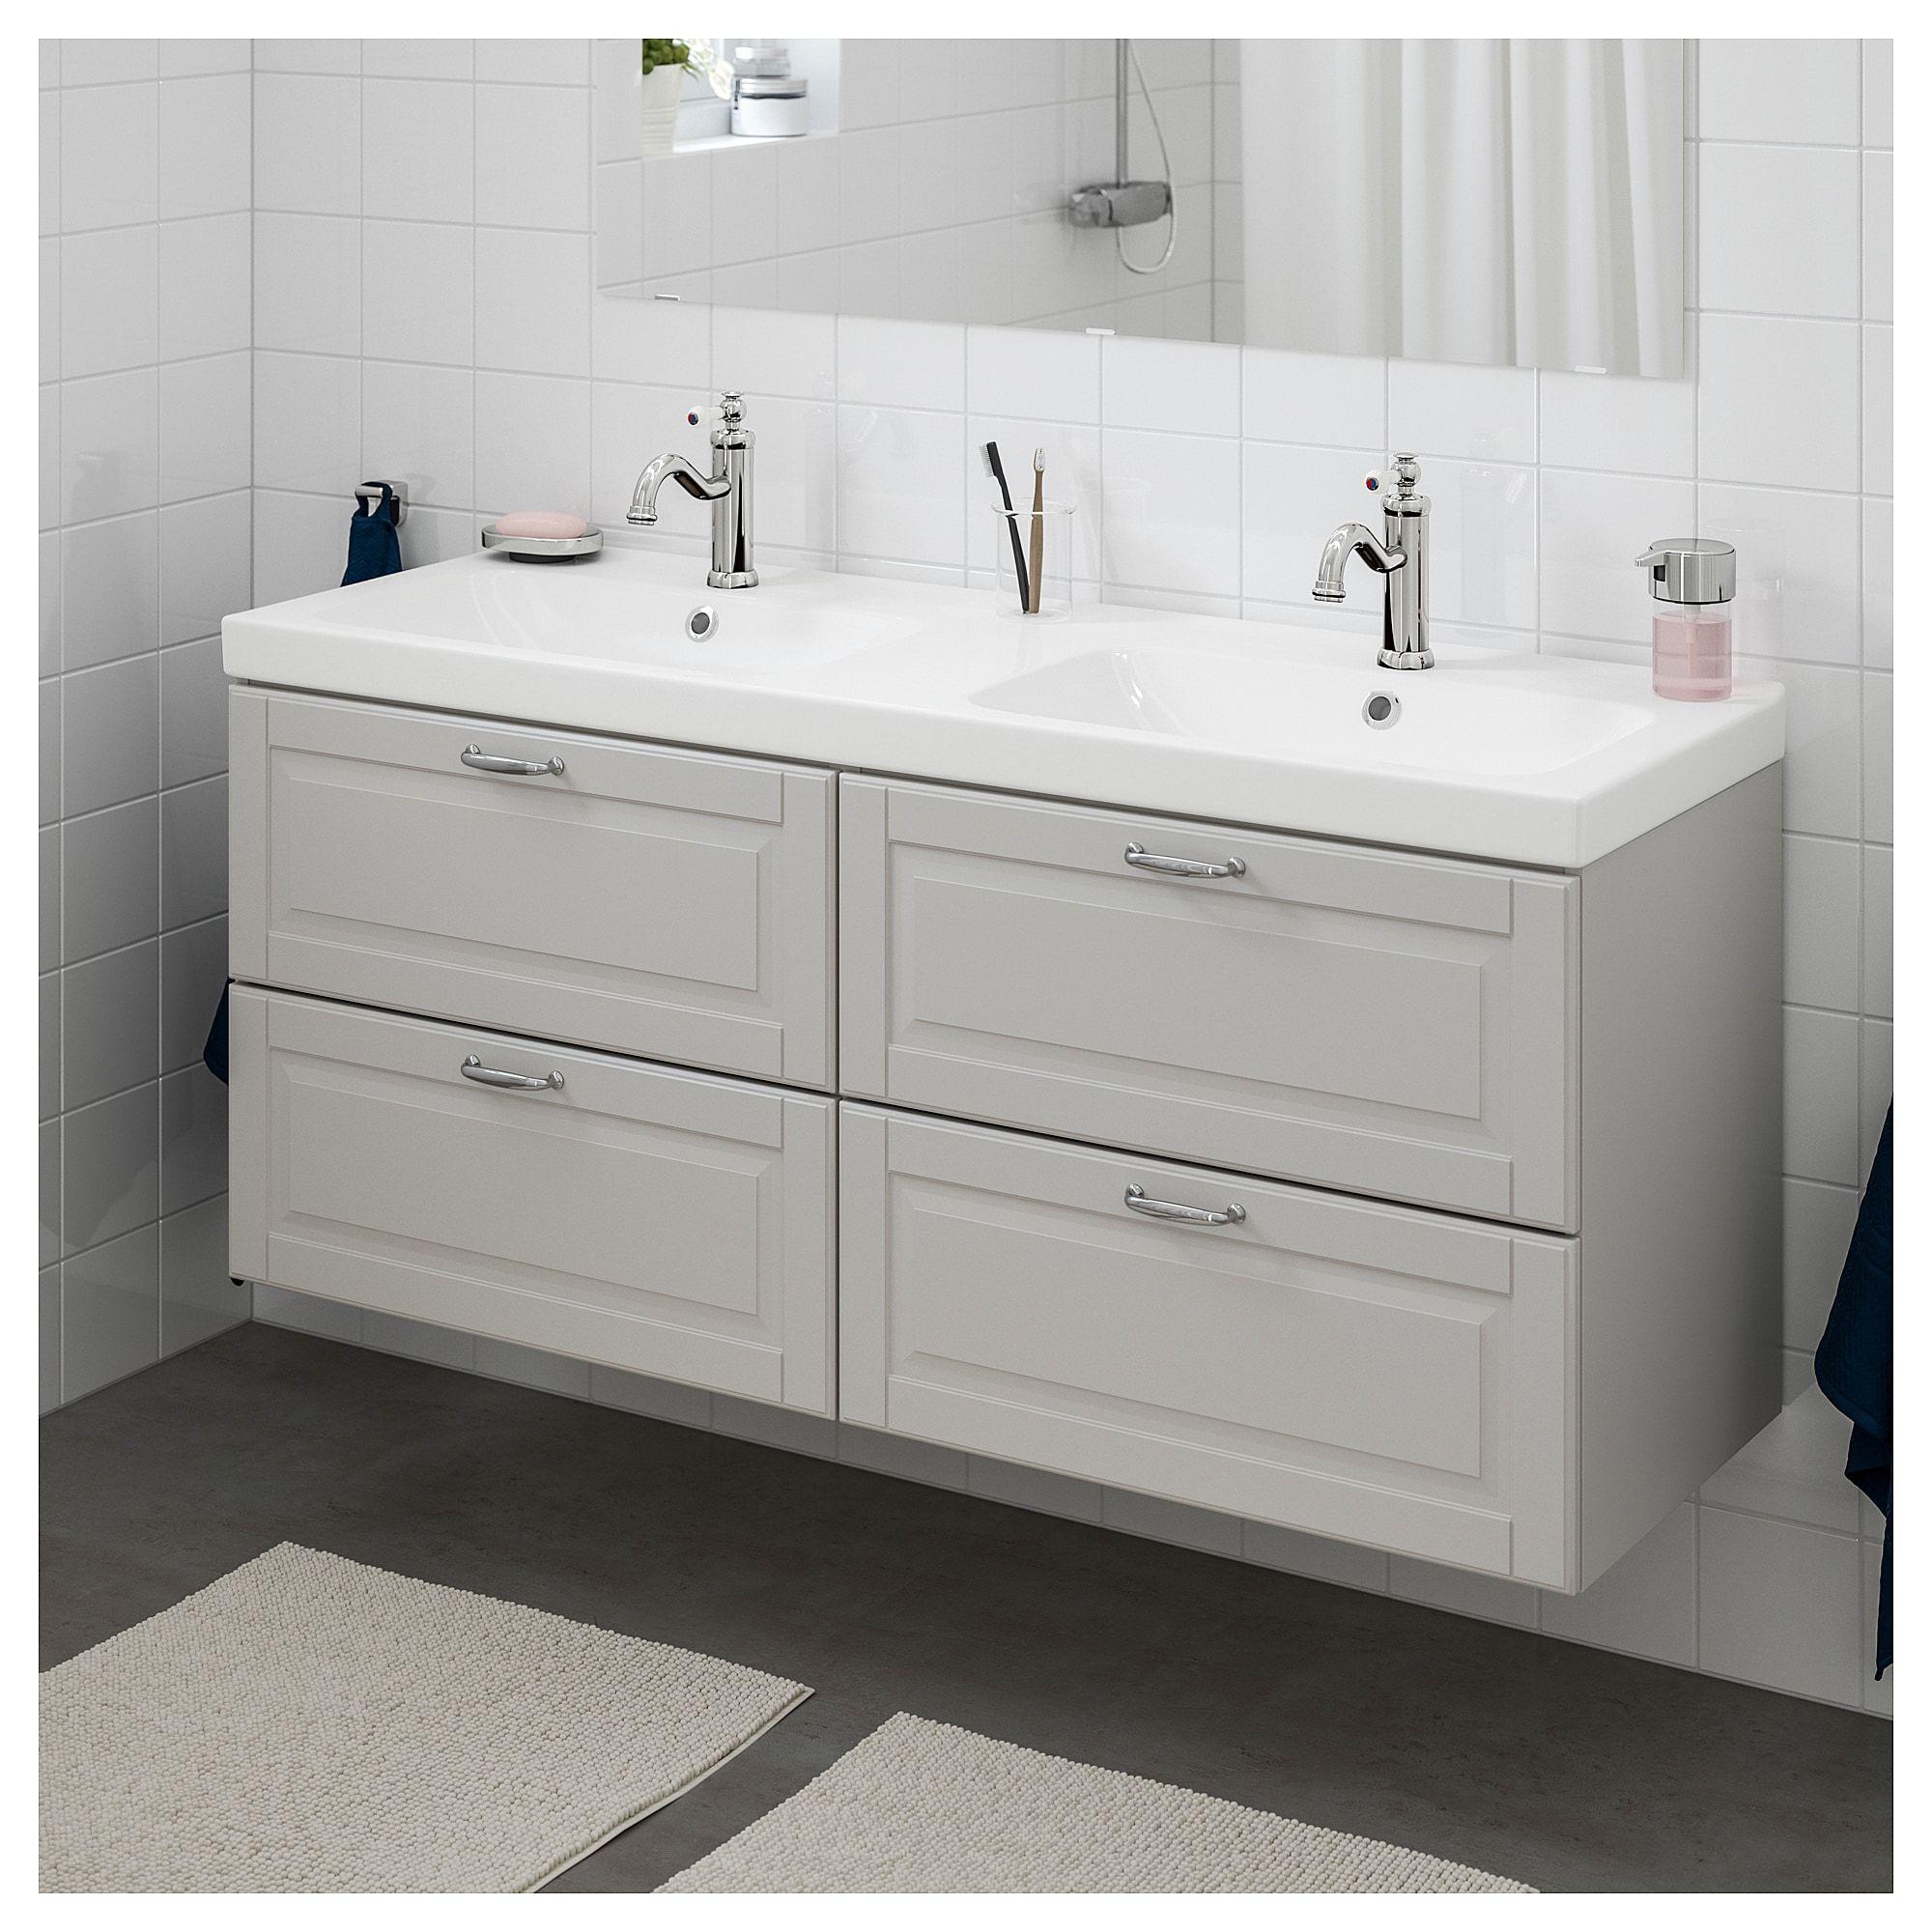 Furniture And Home Furnishings Waschbeckenunterschrank Ikea